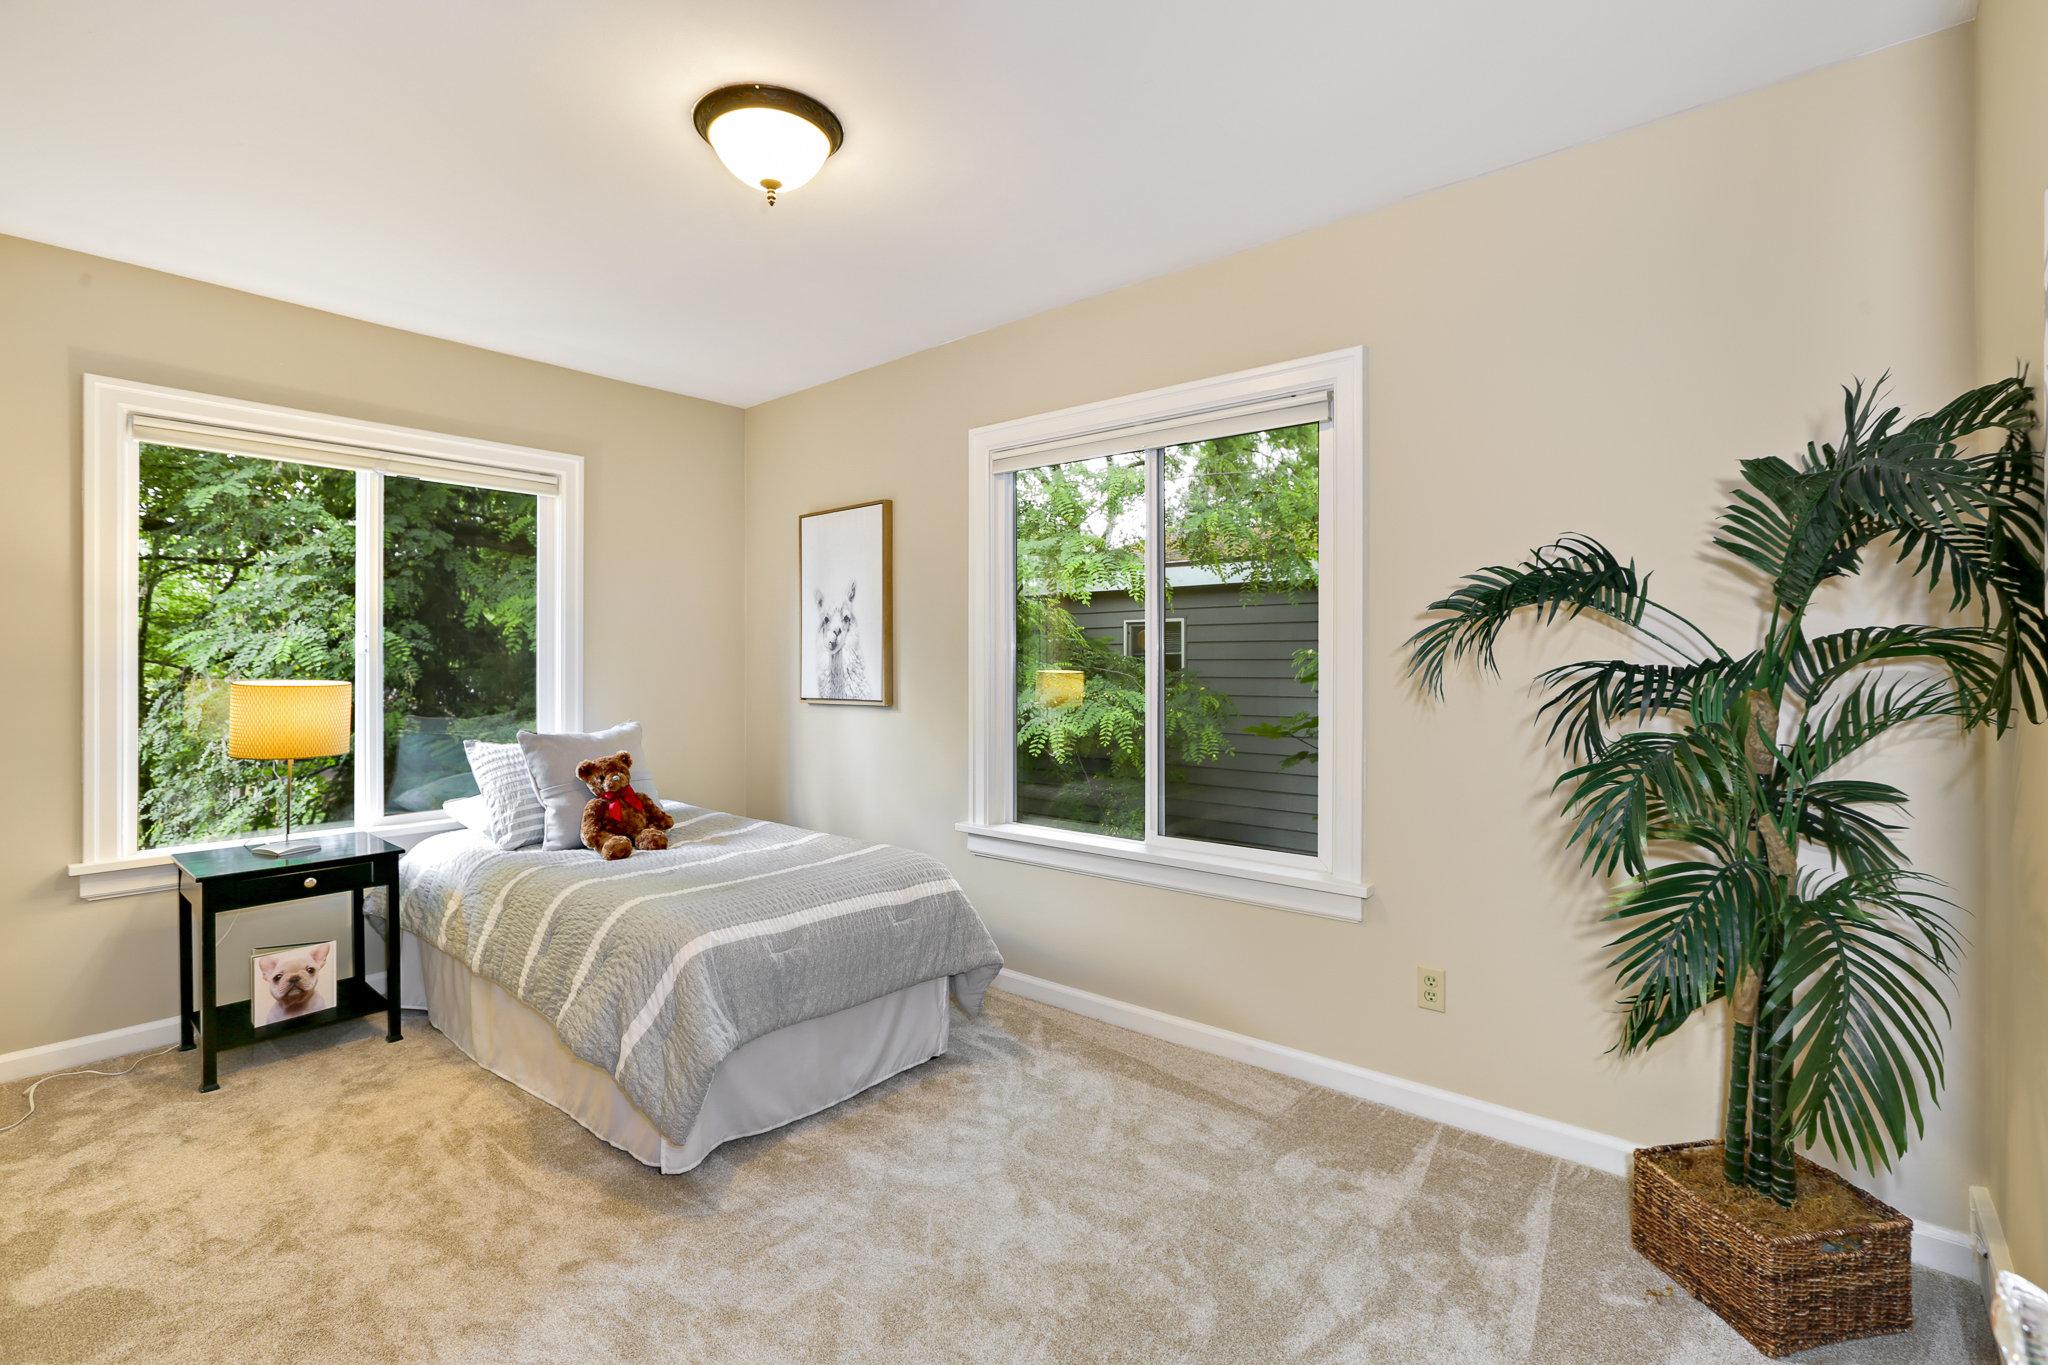 19.7.3 {Heather Rogers} 12354 35th Ave NE, Seattle - EDITED-0029 upstairs kids bedroom 2.jpg